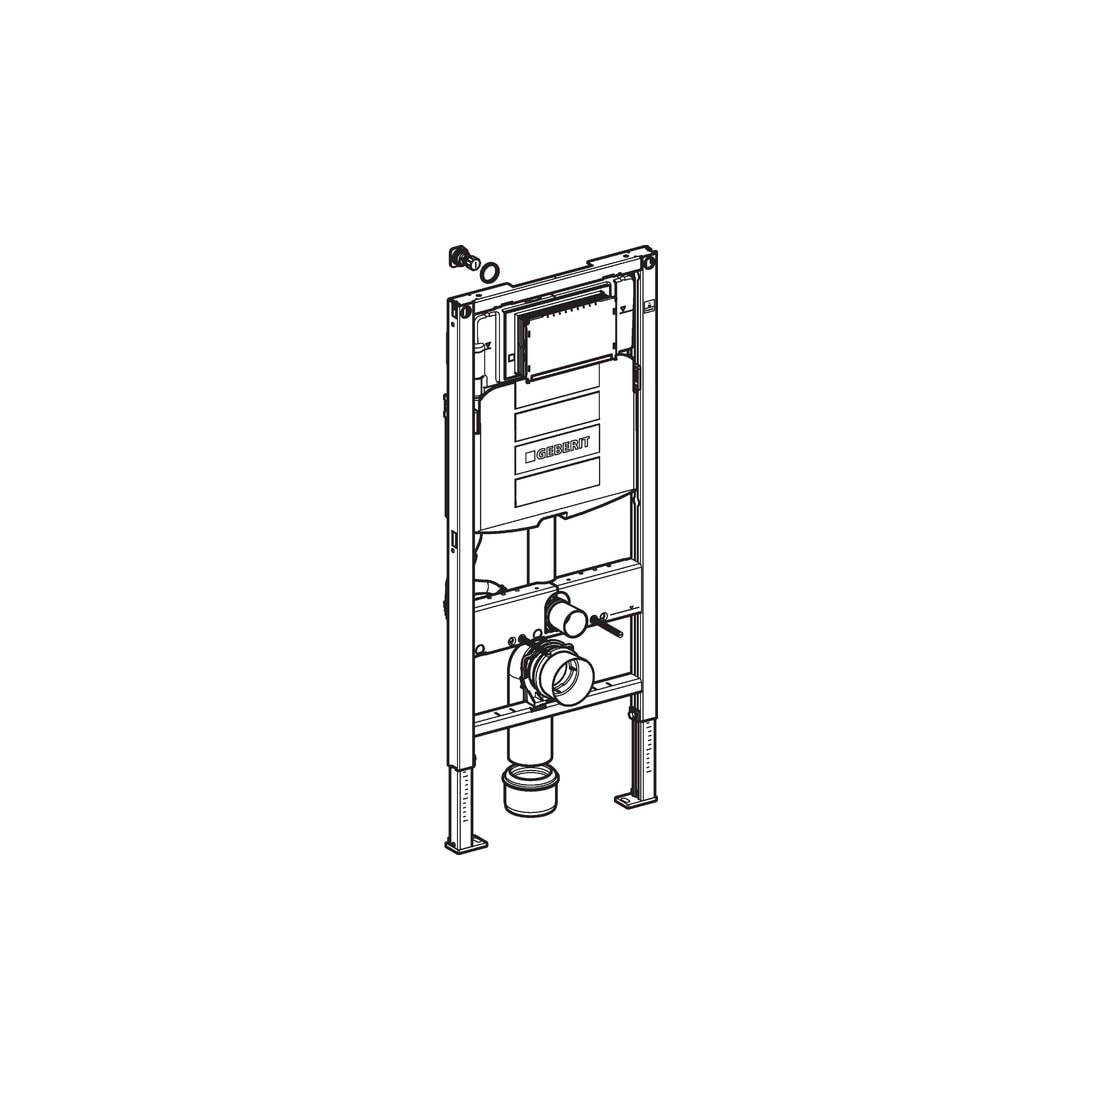 WC rėmas Geberit, Duofix UP320 Sigma